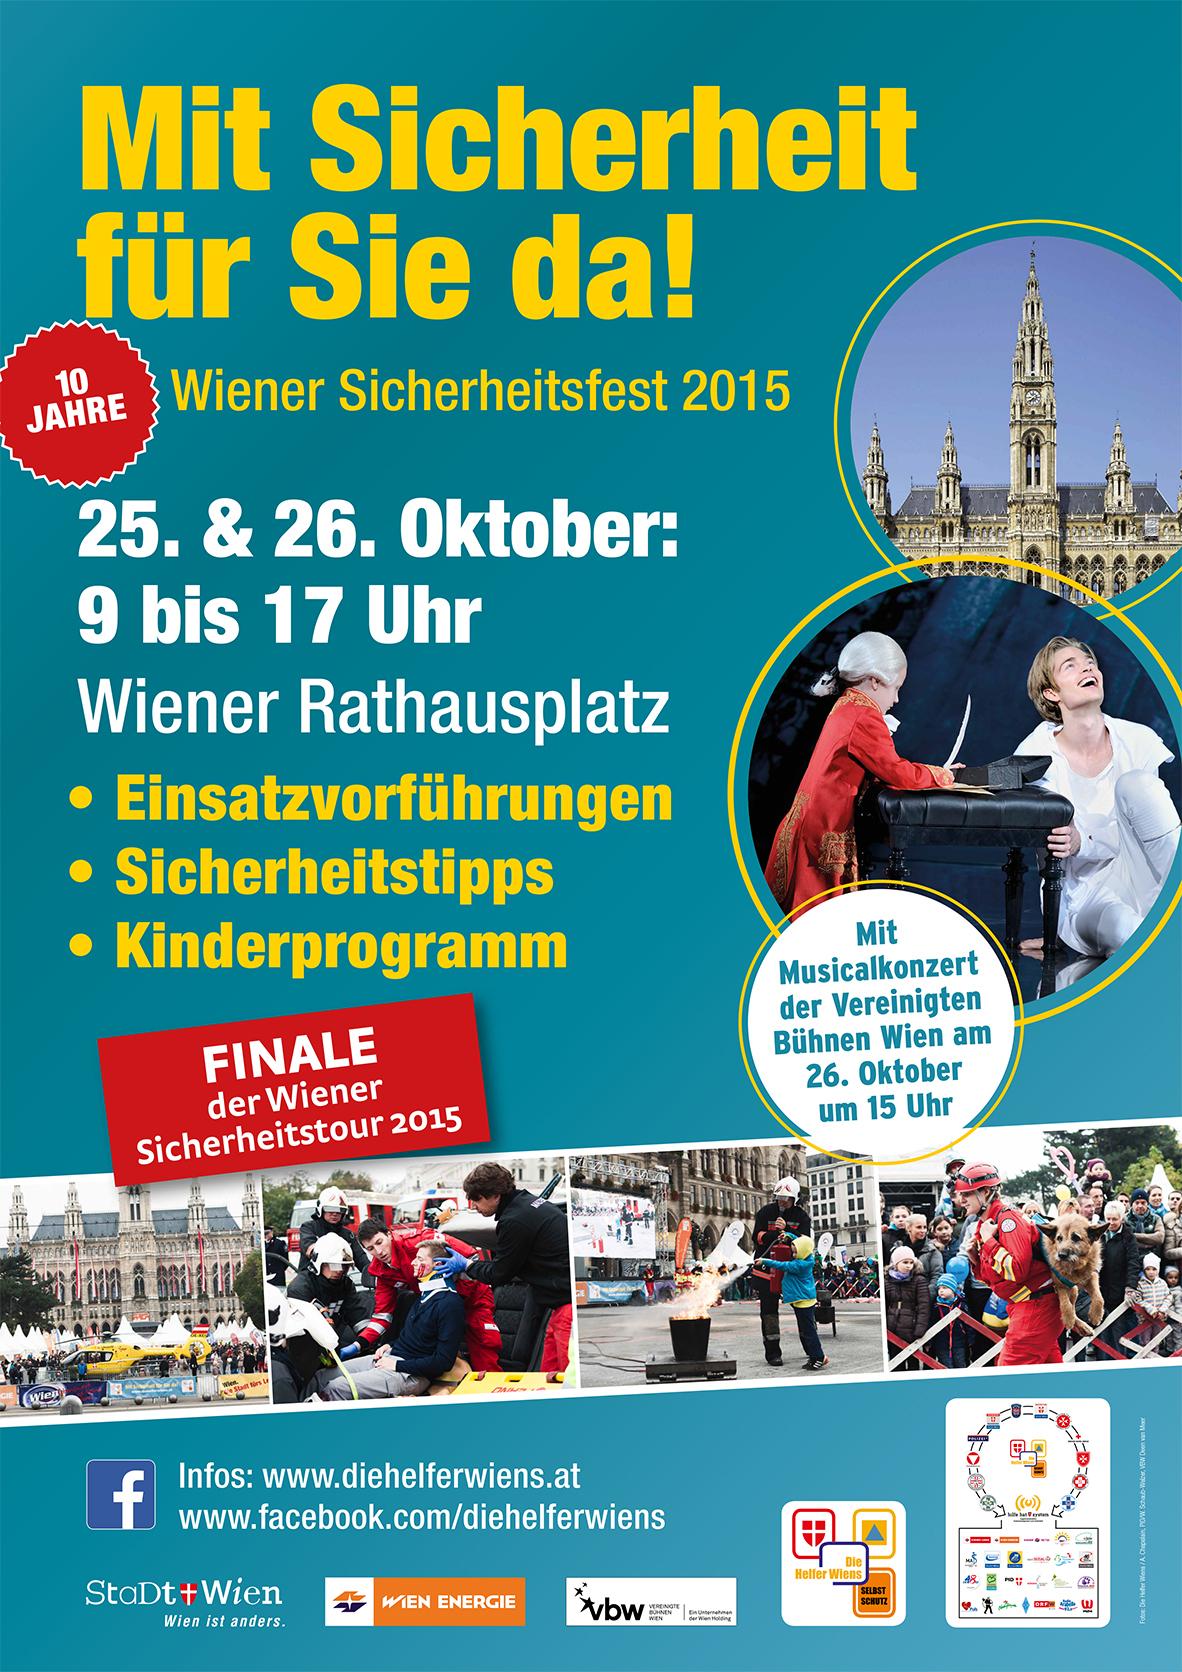 http://www.siz.cc/tools/image.php?image=Plakat_Wiener_Sicherheitsfest.jpg&width=&height=